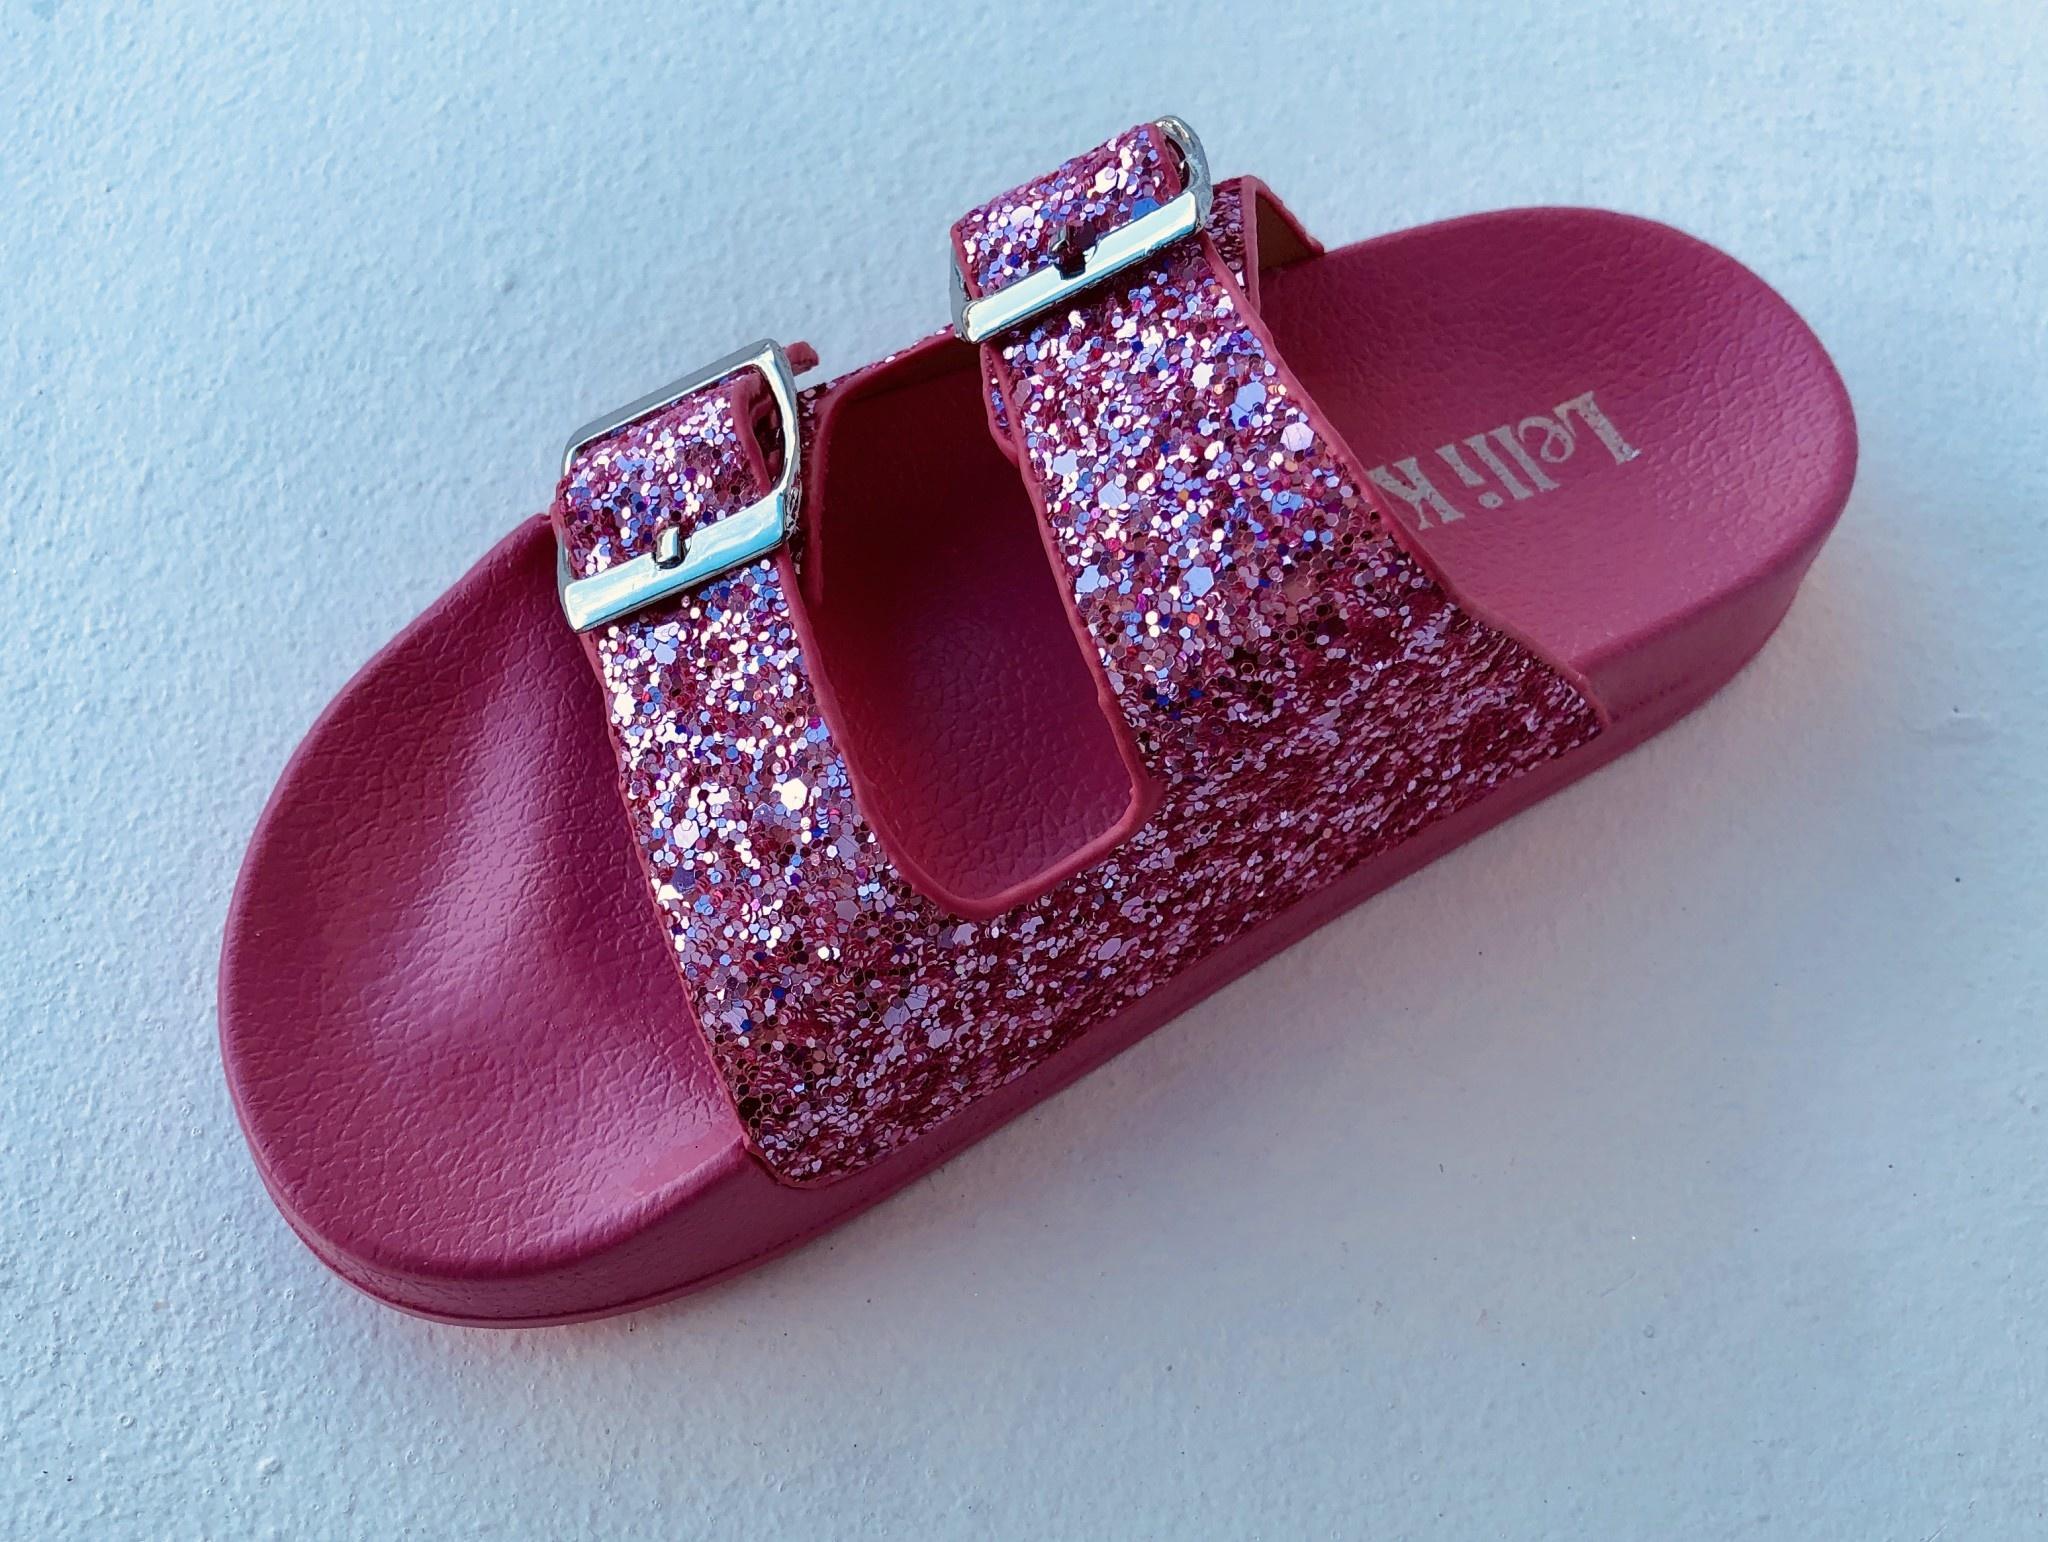 Lelli Kelly Lelli Kelly LK9910 Elga Pink Glitter Sandal